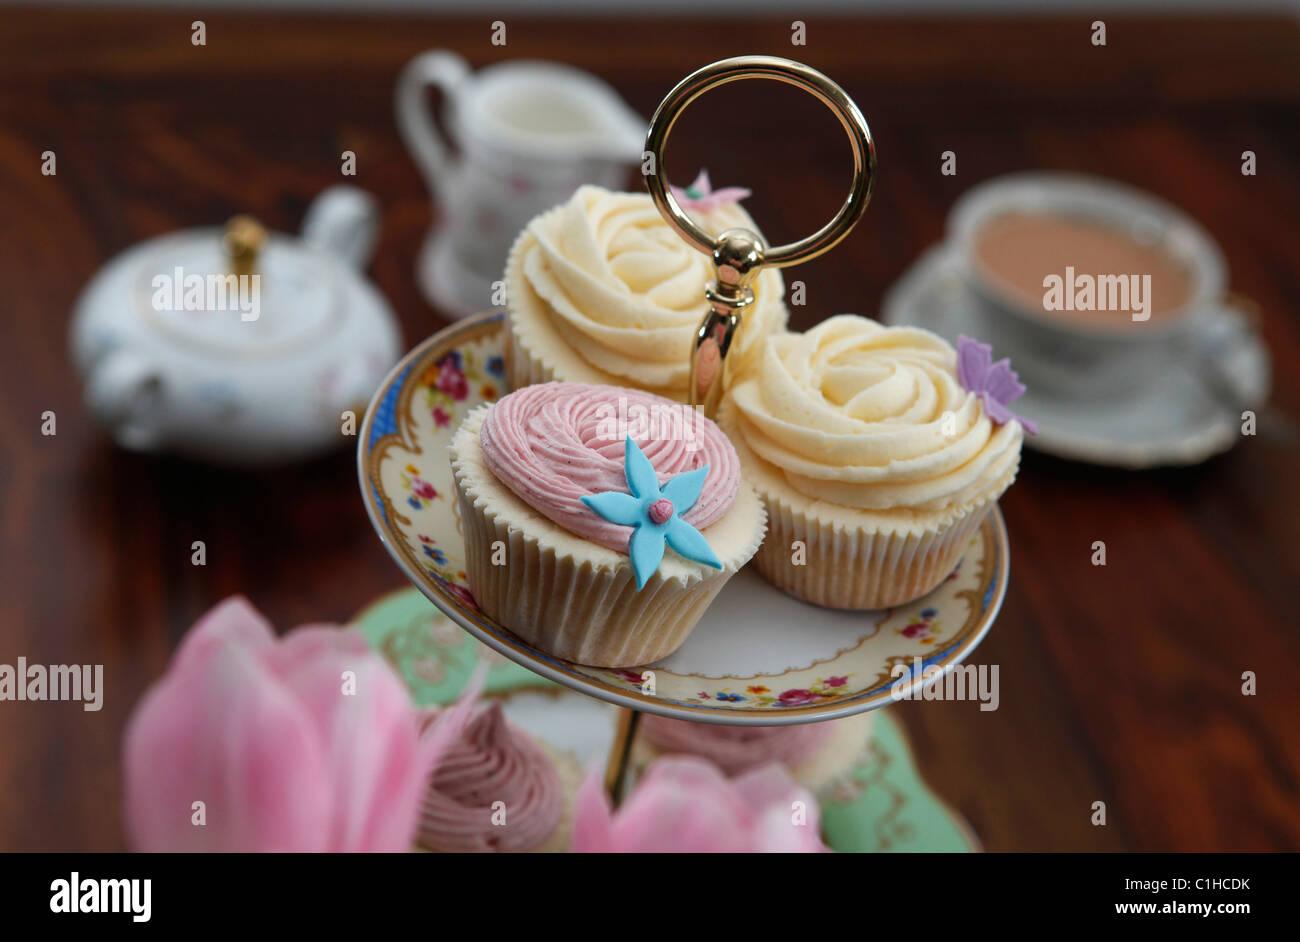 Cupcake Photo Stock